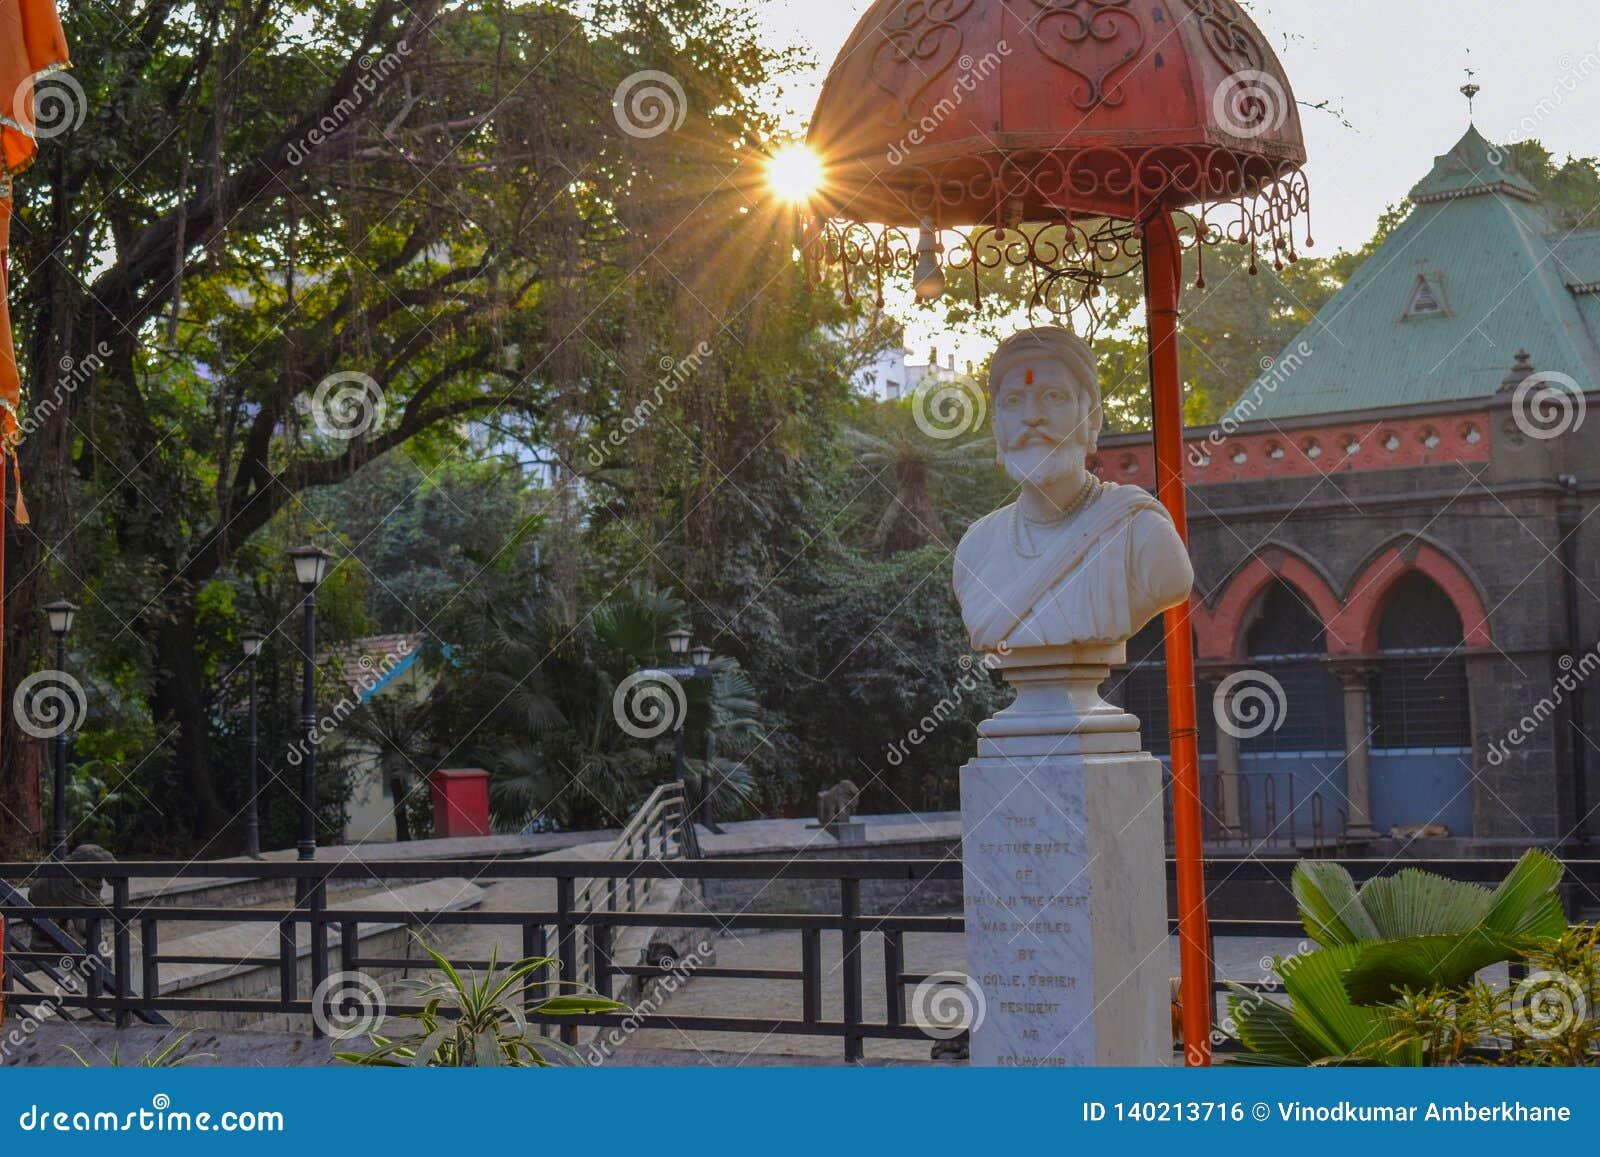 马哈拉施特拉chattrapathi shivaji马哈拉杰的国王